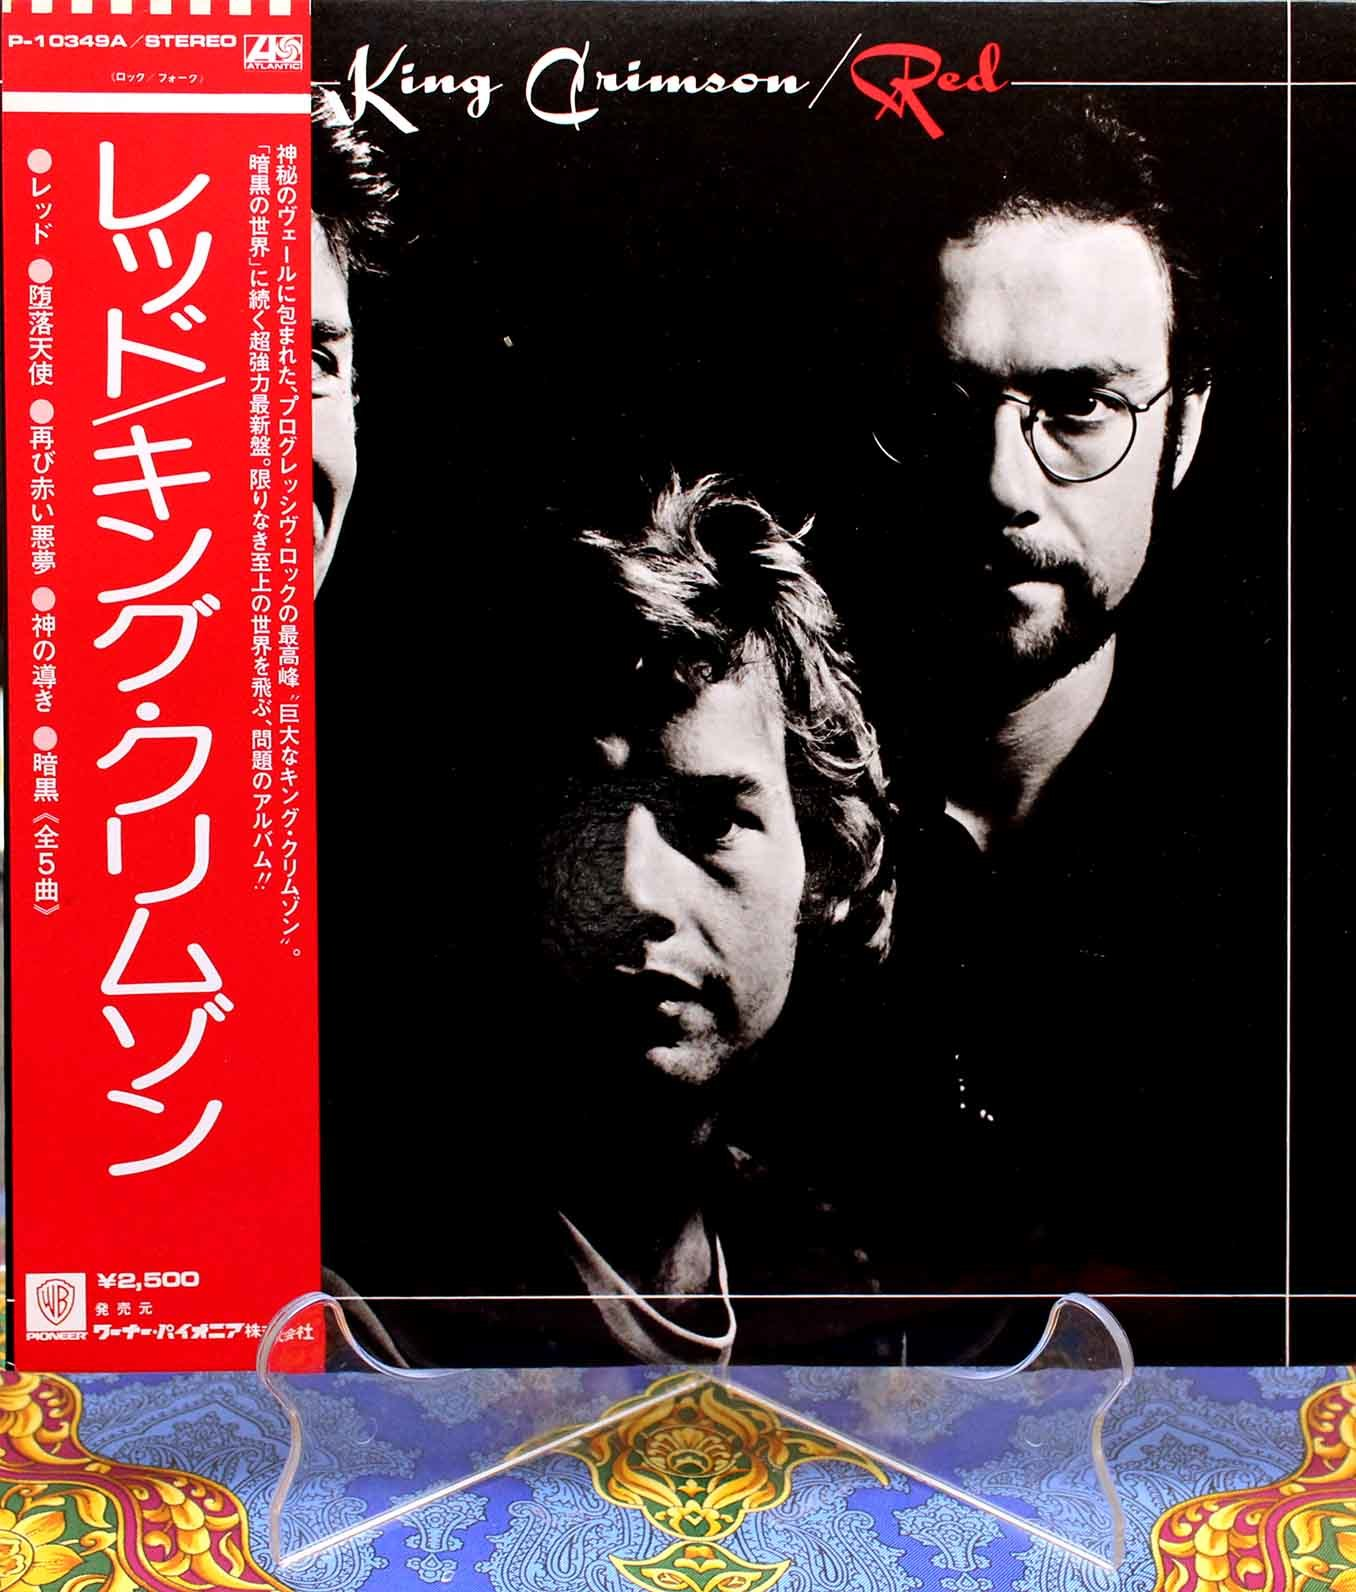 King Crimson – Red 01